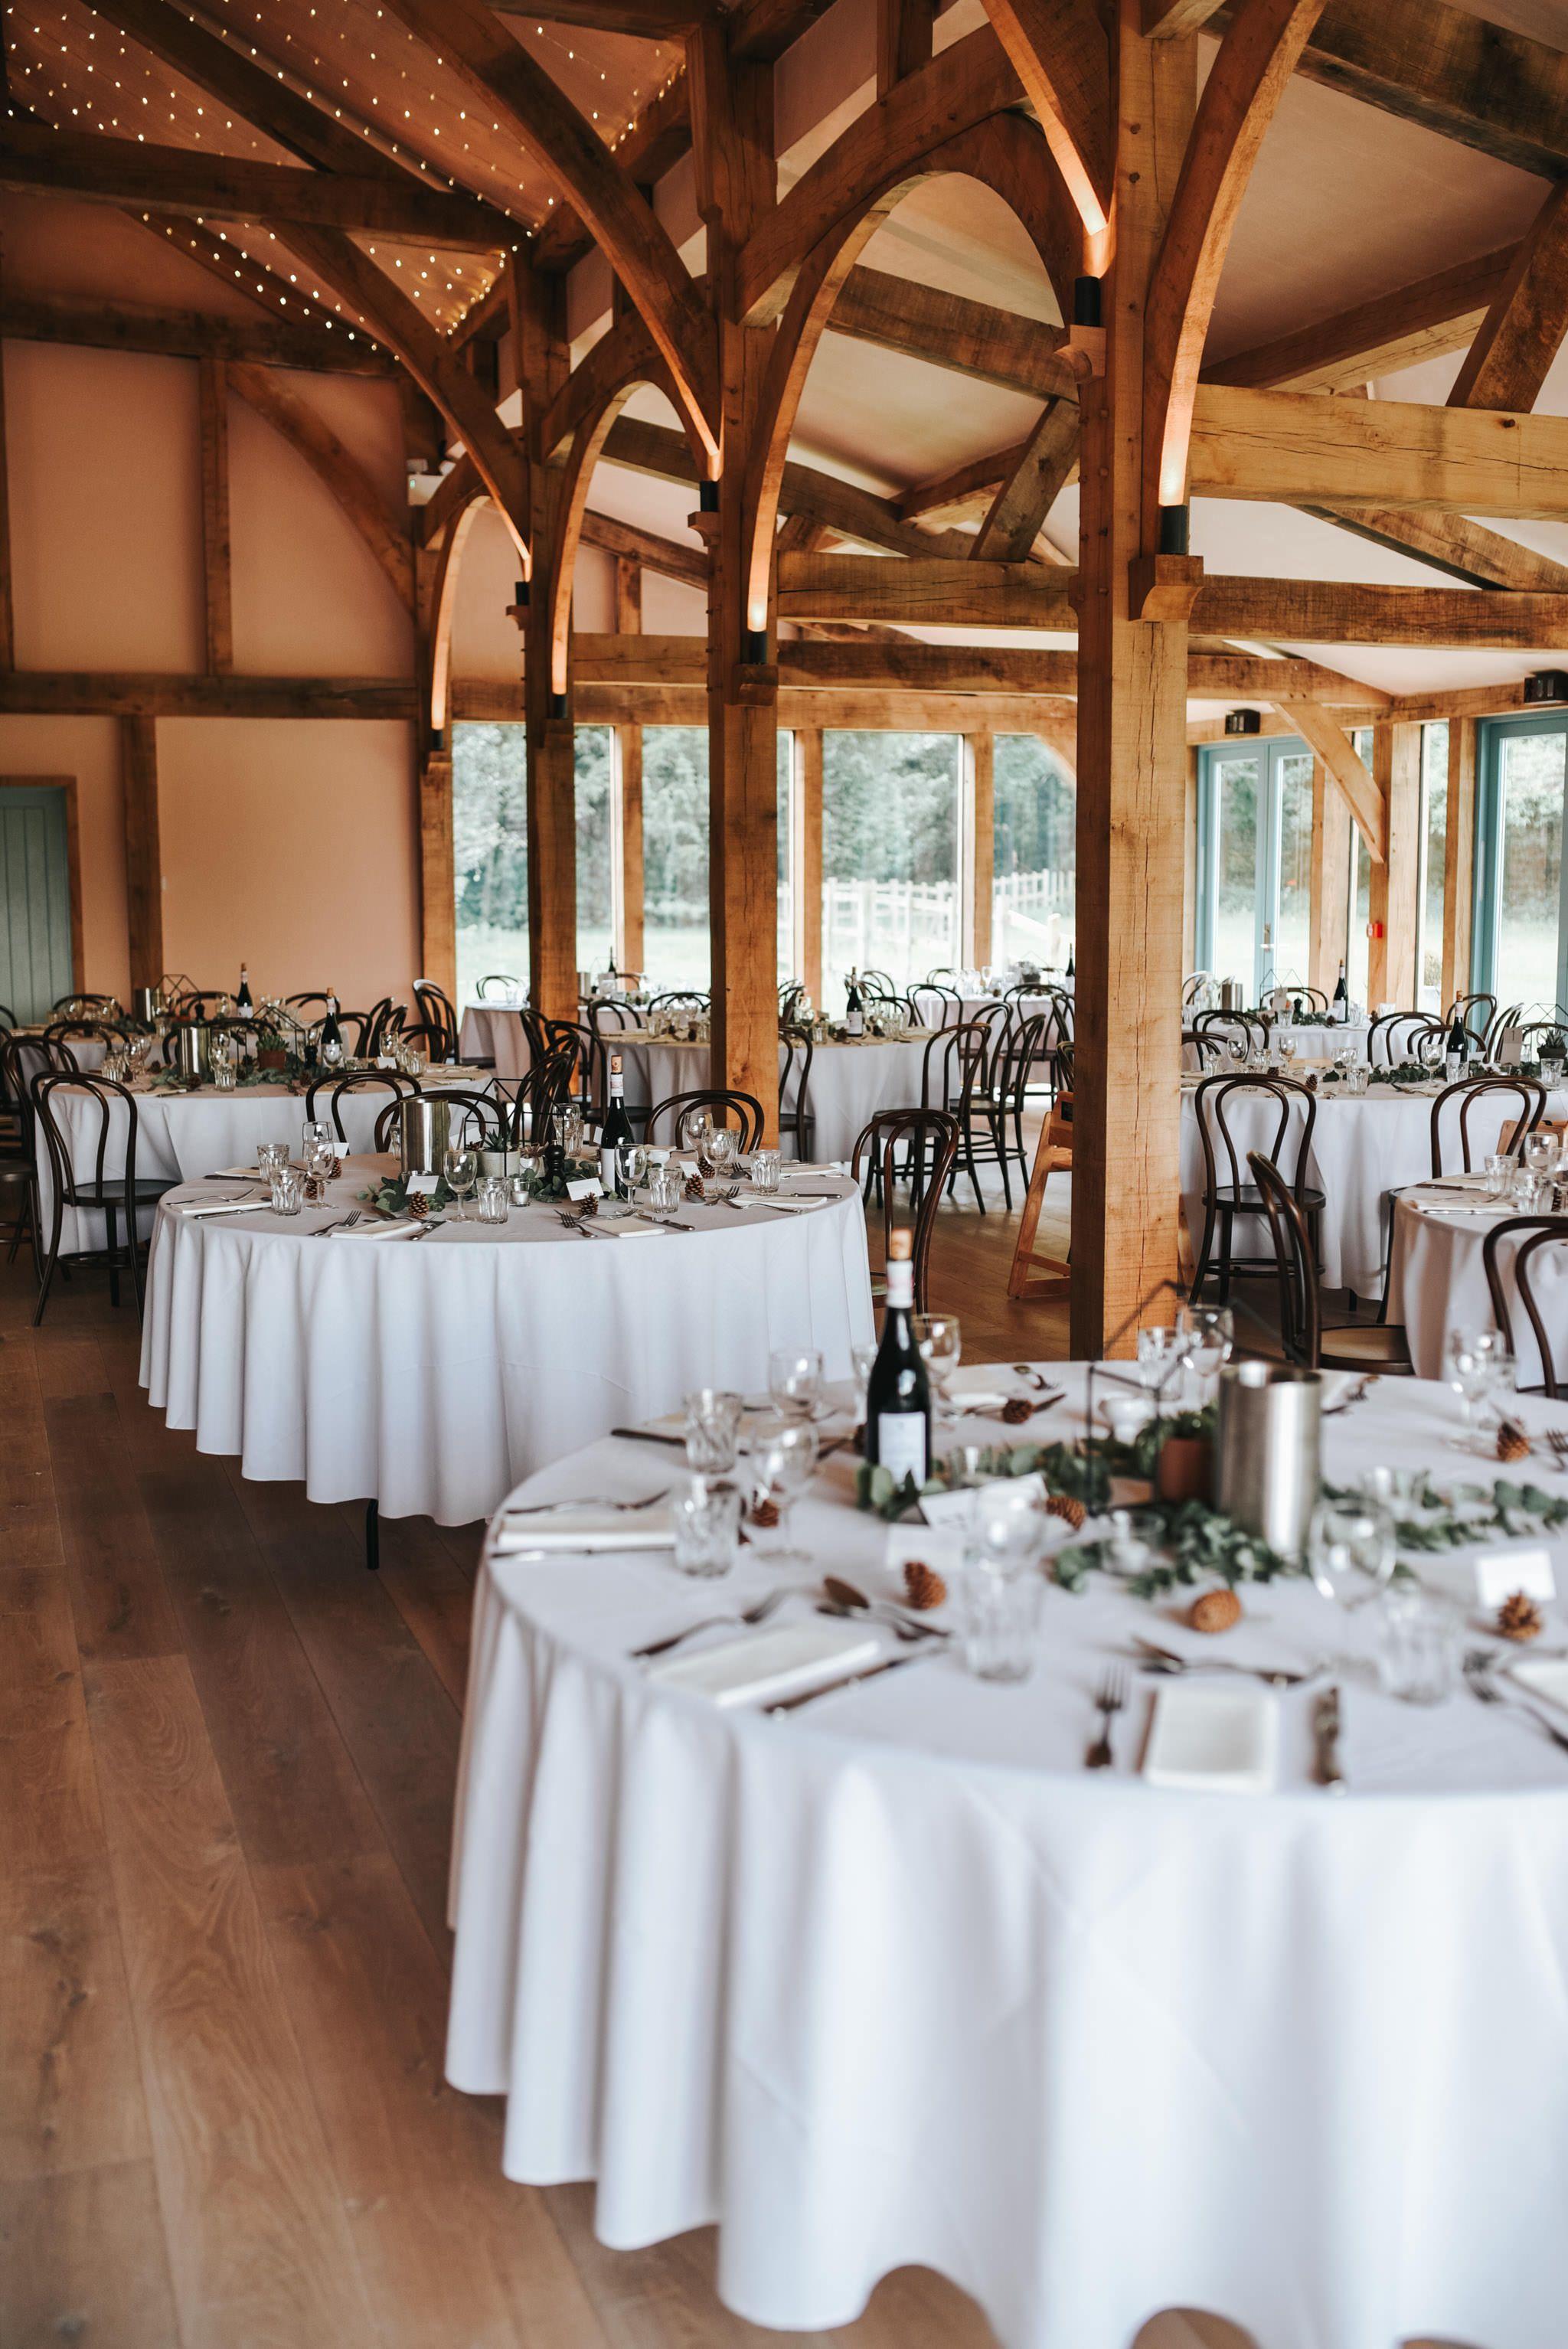 Hazel Gap Barn Wedding Pinterest Barn Wedding And Barn Weddings